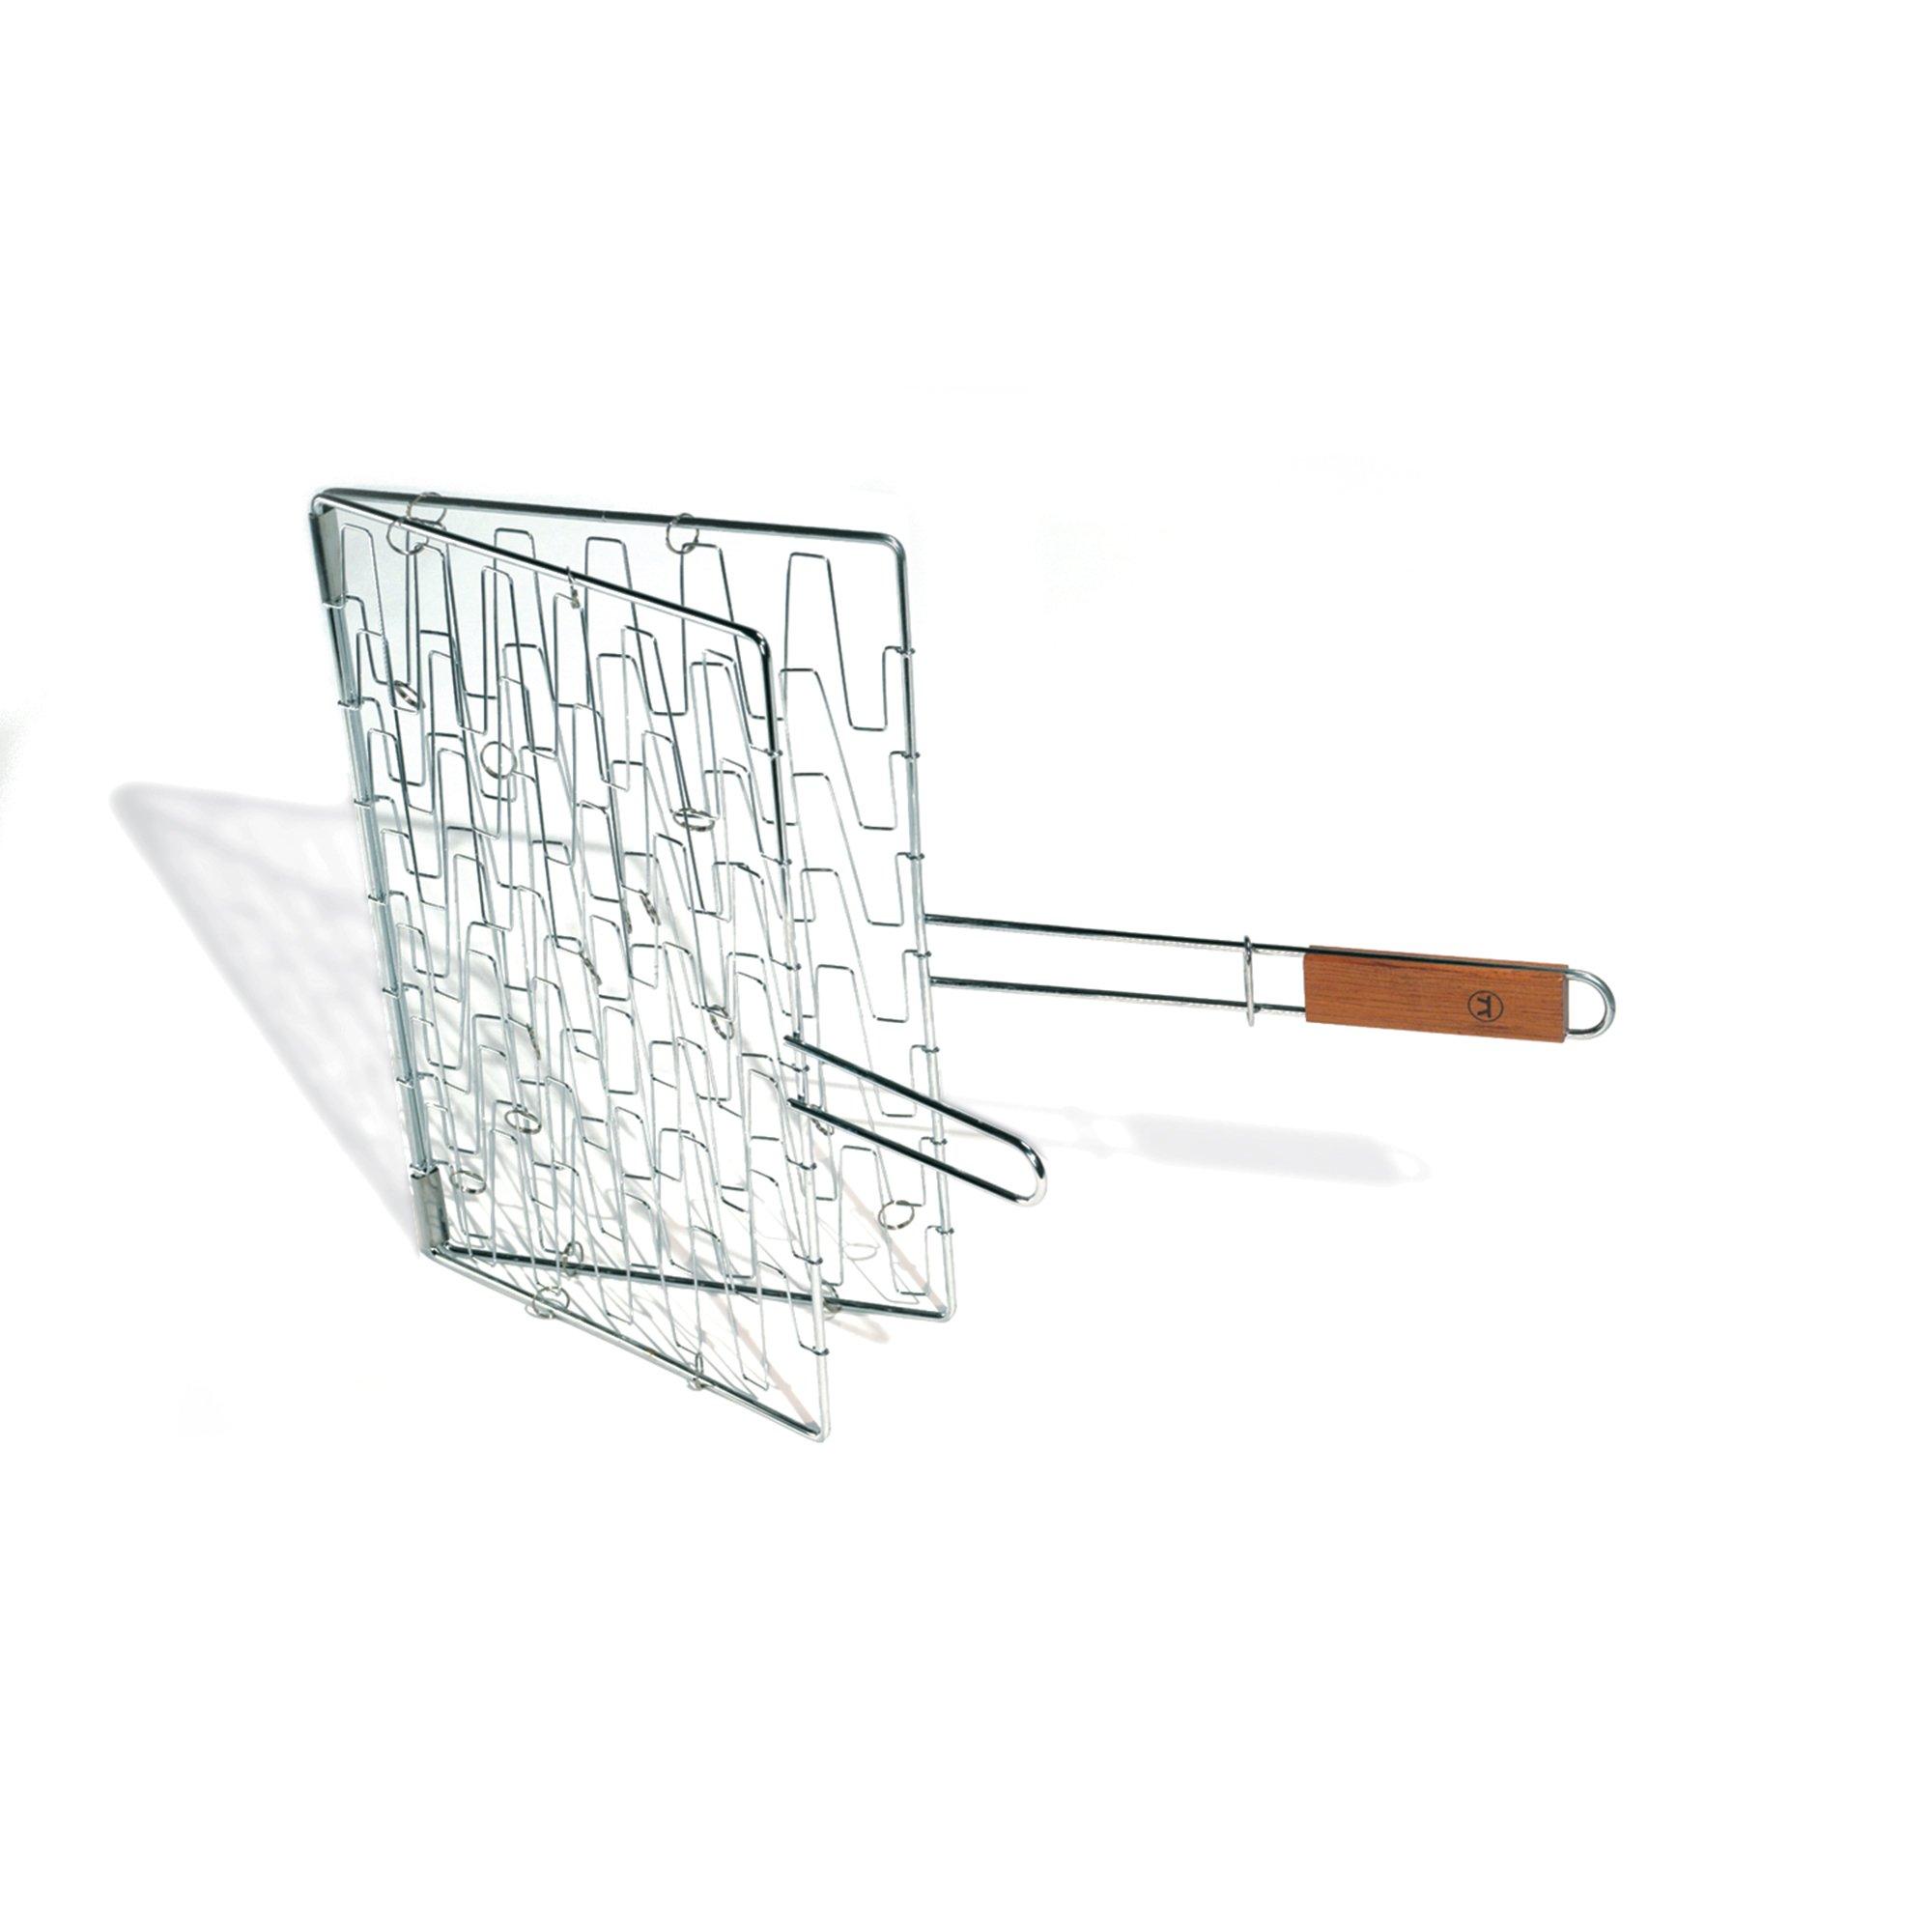 Outset QC73 Rosewood Flex Grill Basket, Metallic